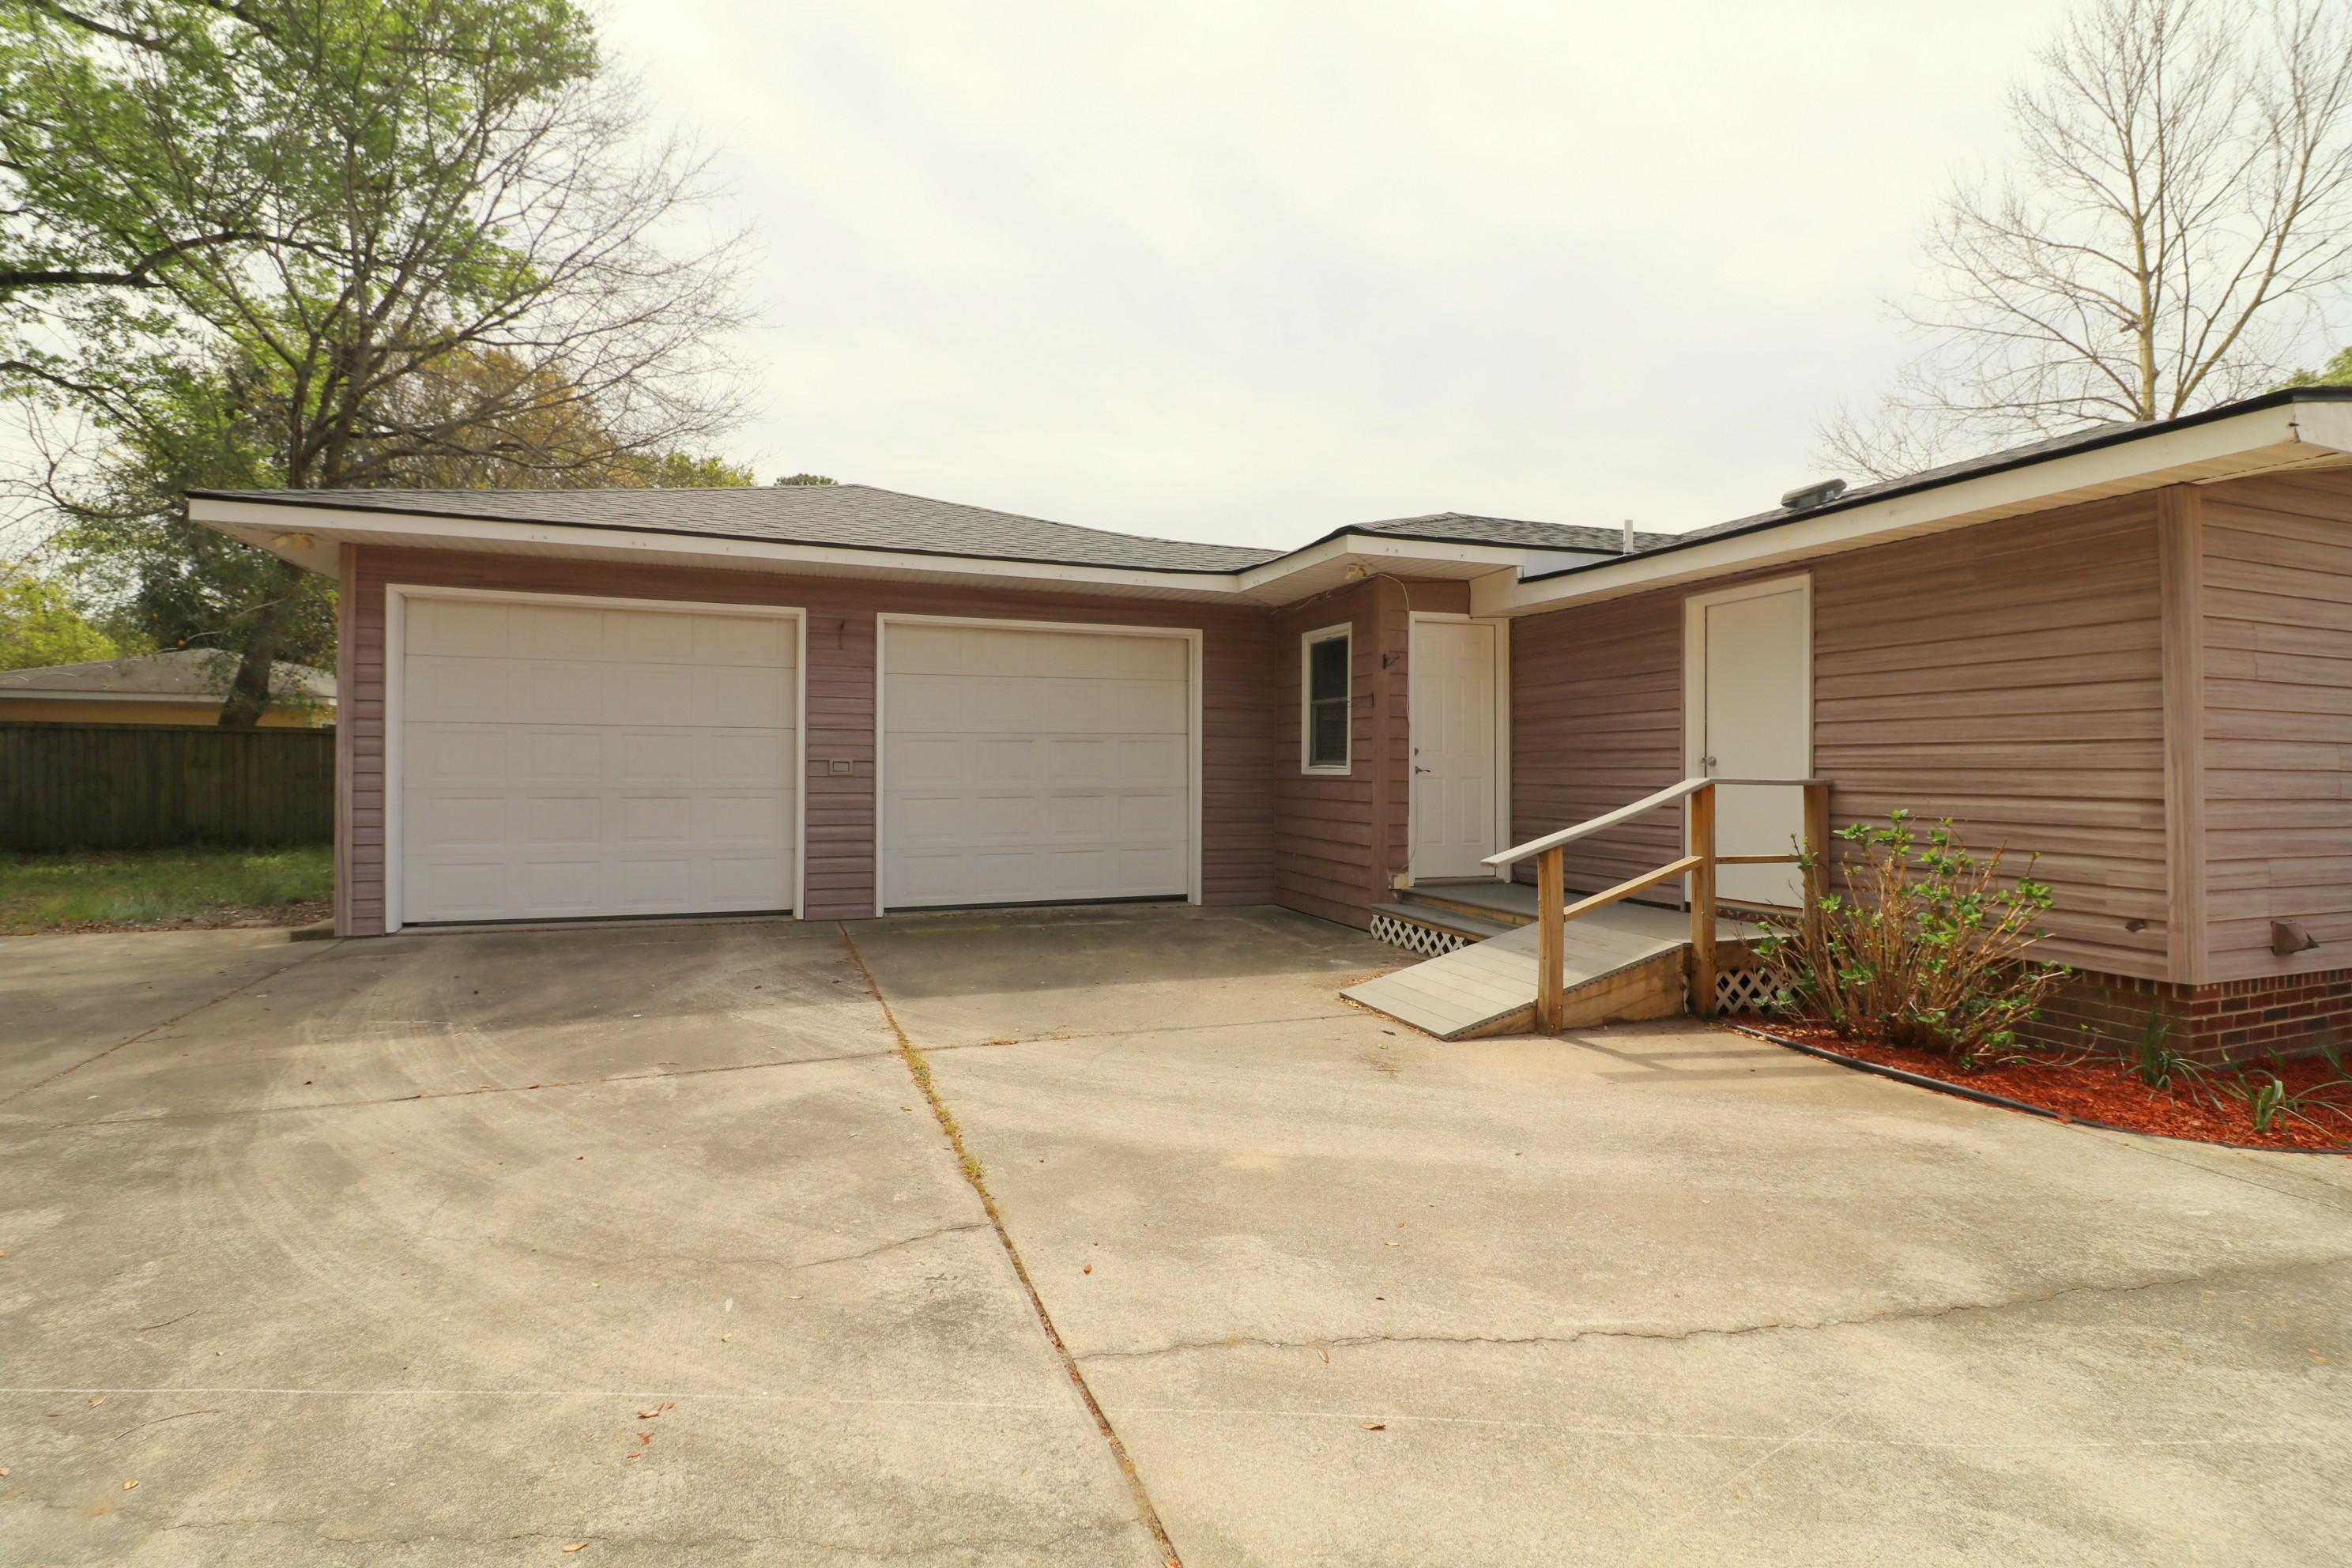 Park Circle Homes For Sale - 5274 Potomac, North Charleston, SC - 0